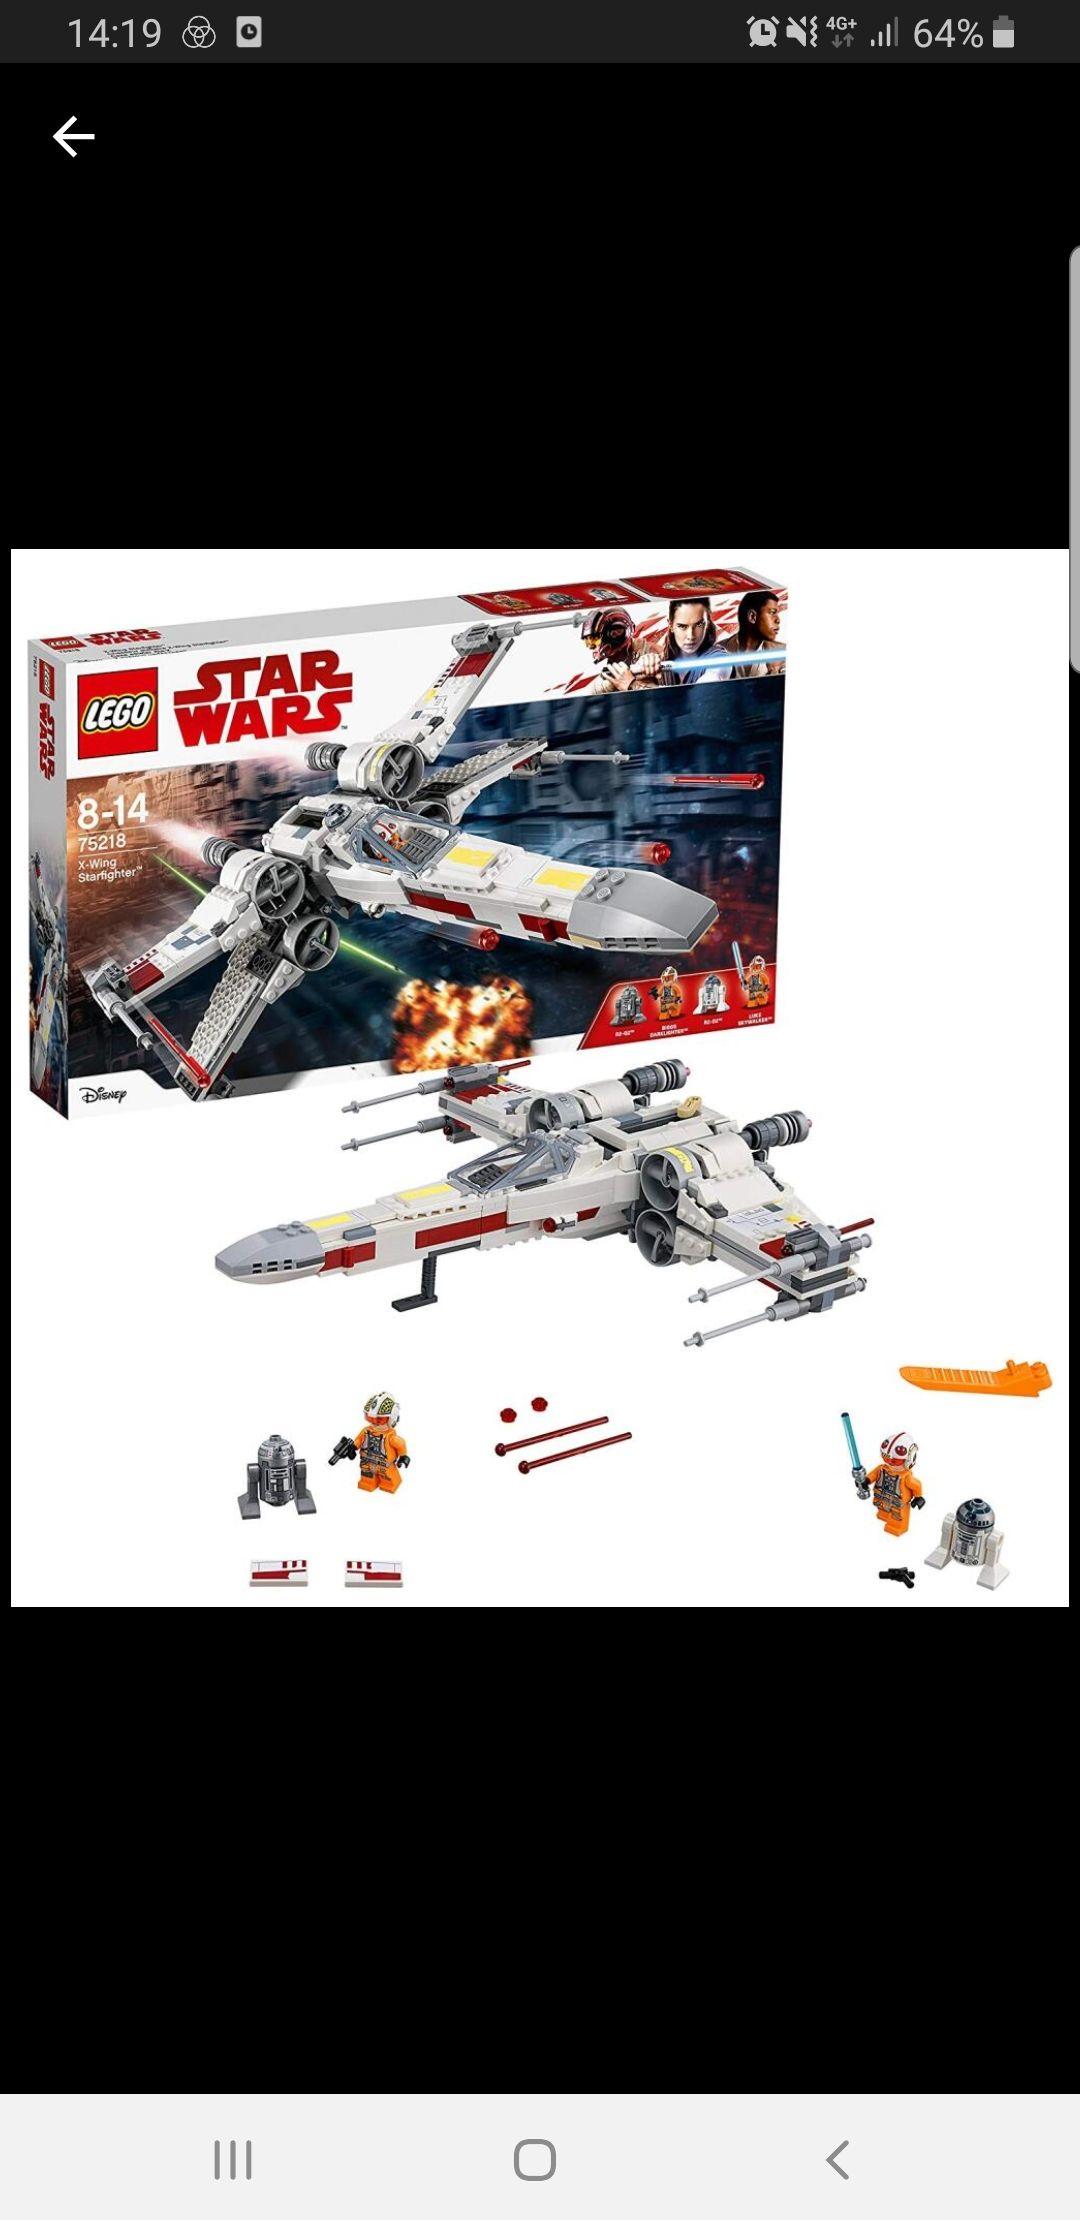 Jeu de Construction Lego Star Wars 75218 - Chasseur stellaire X-Wing Starfighter (Via 32.45€ sur la Carte) - Claye Souilly(77)